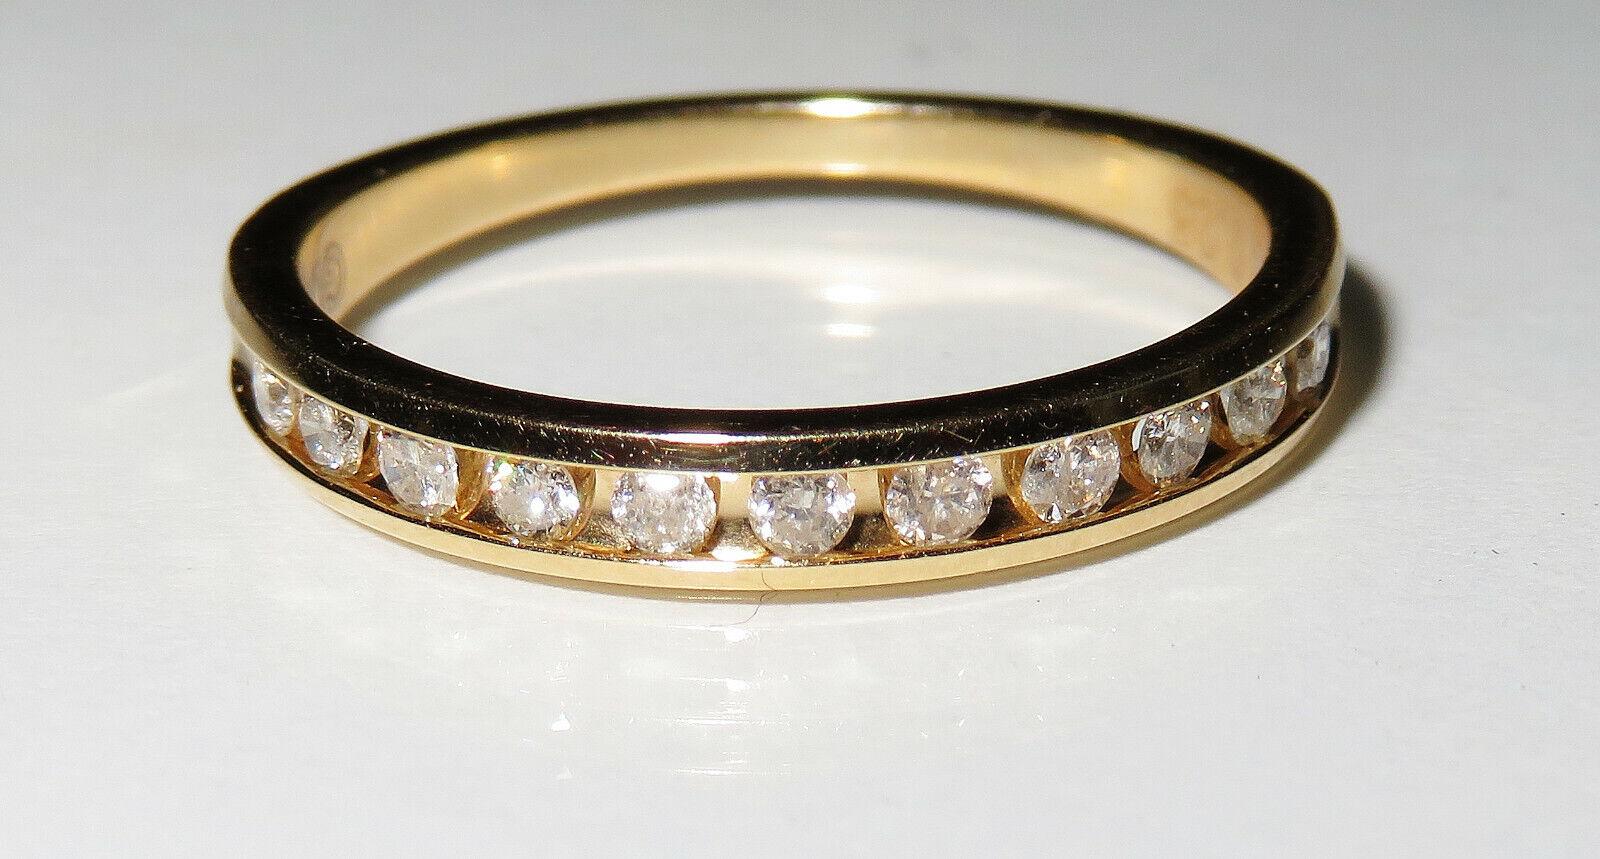 0.85 Ct Round Diamond Halo Cluster Engagement Wedding Ring 14k White Gold Over Refreshment Fine Rings Diamond